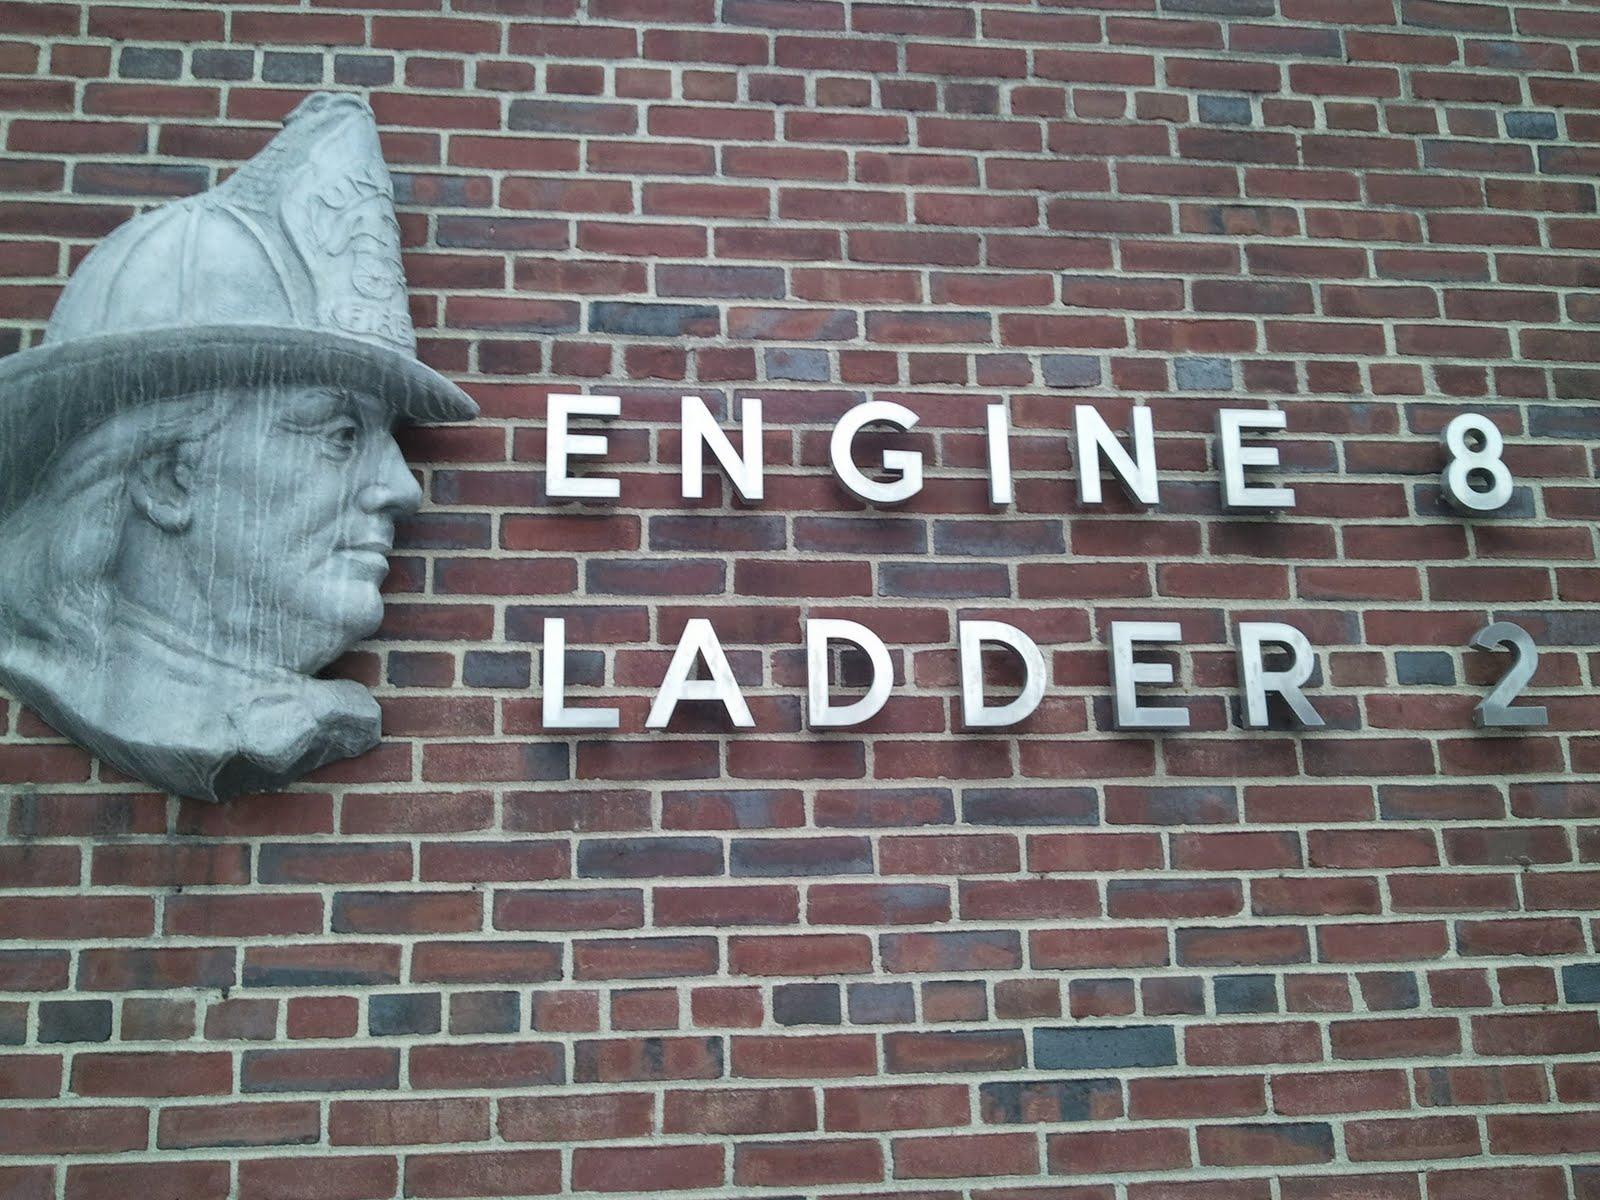 Philadelphia Engine 8 Ladder 2